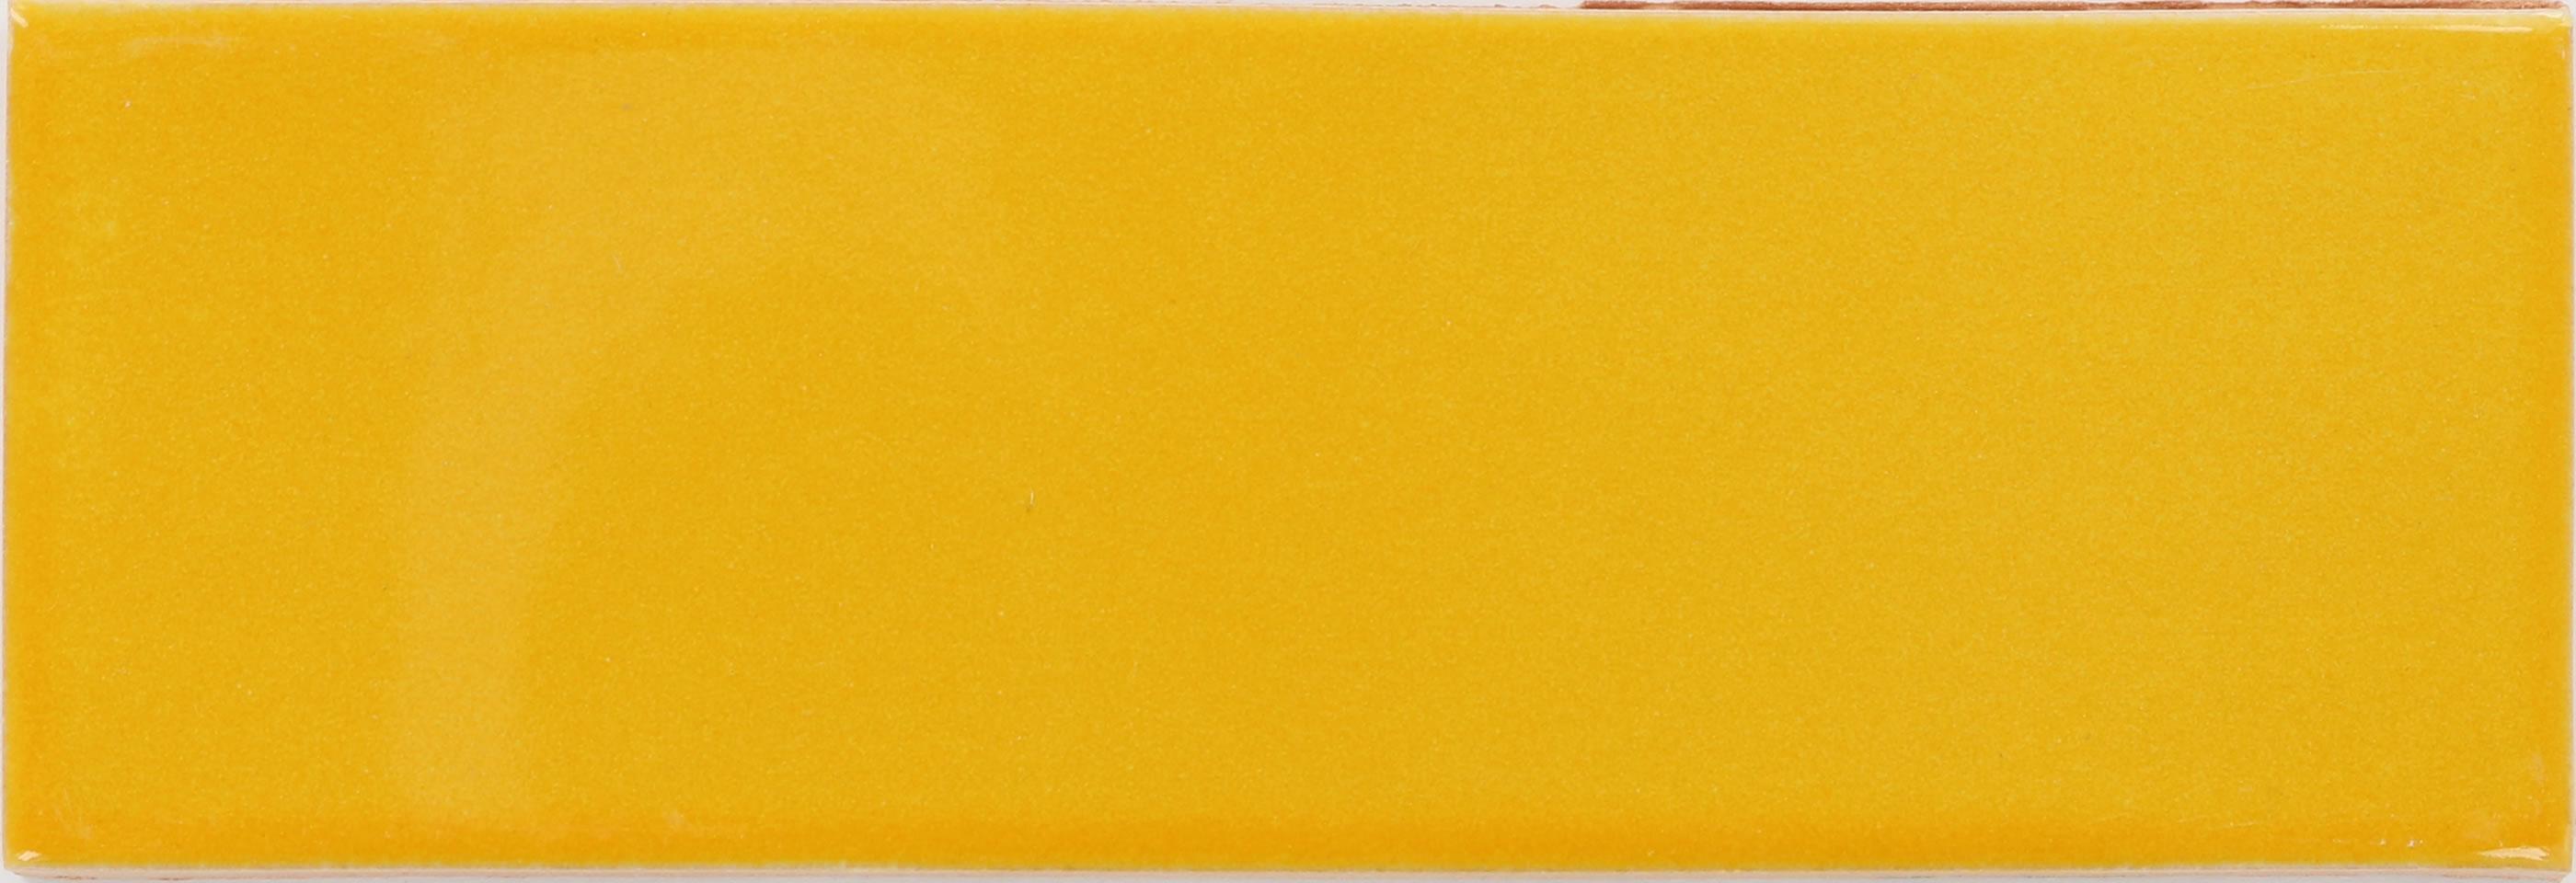 tangerine yellow talavera mexican subway tile